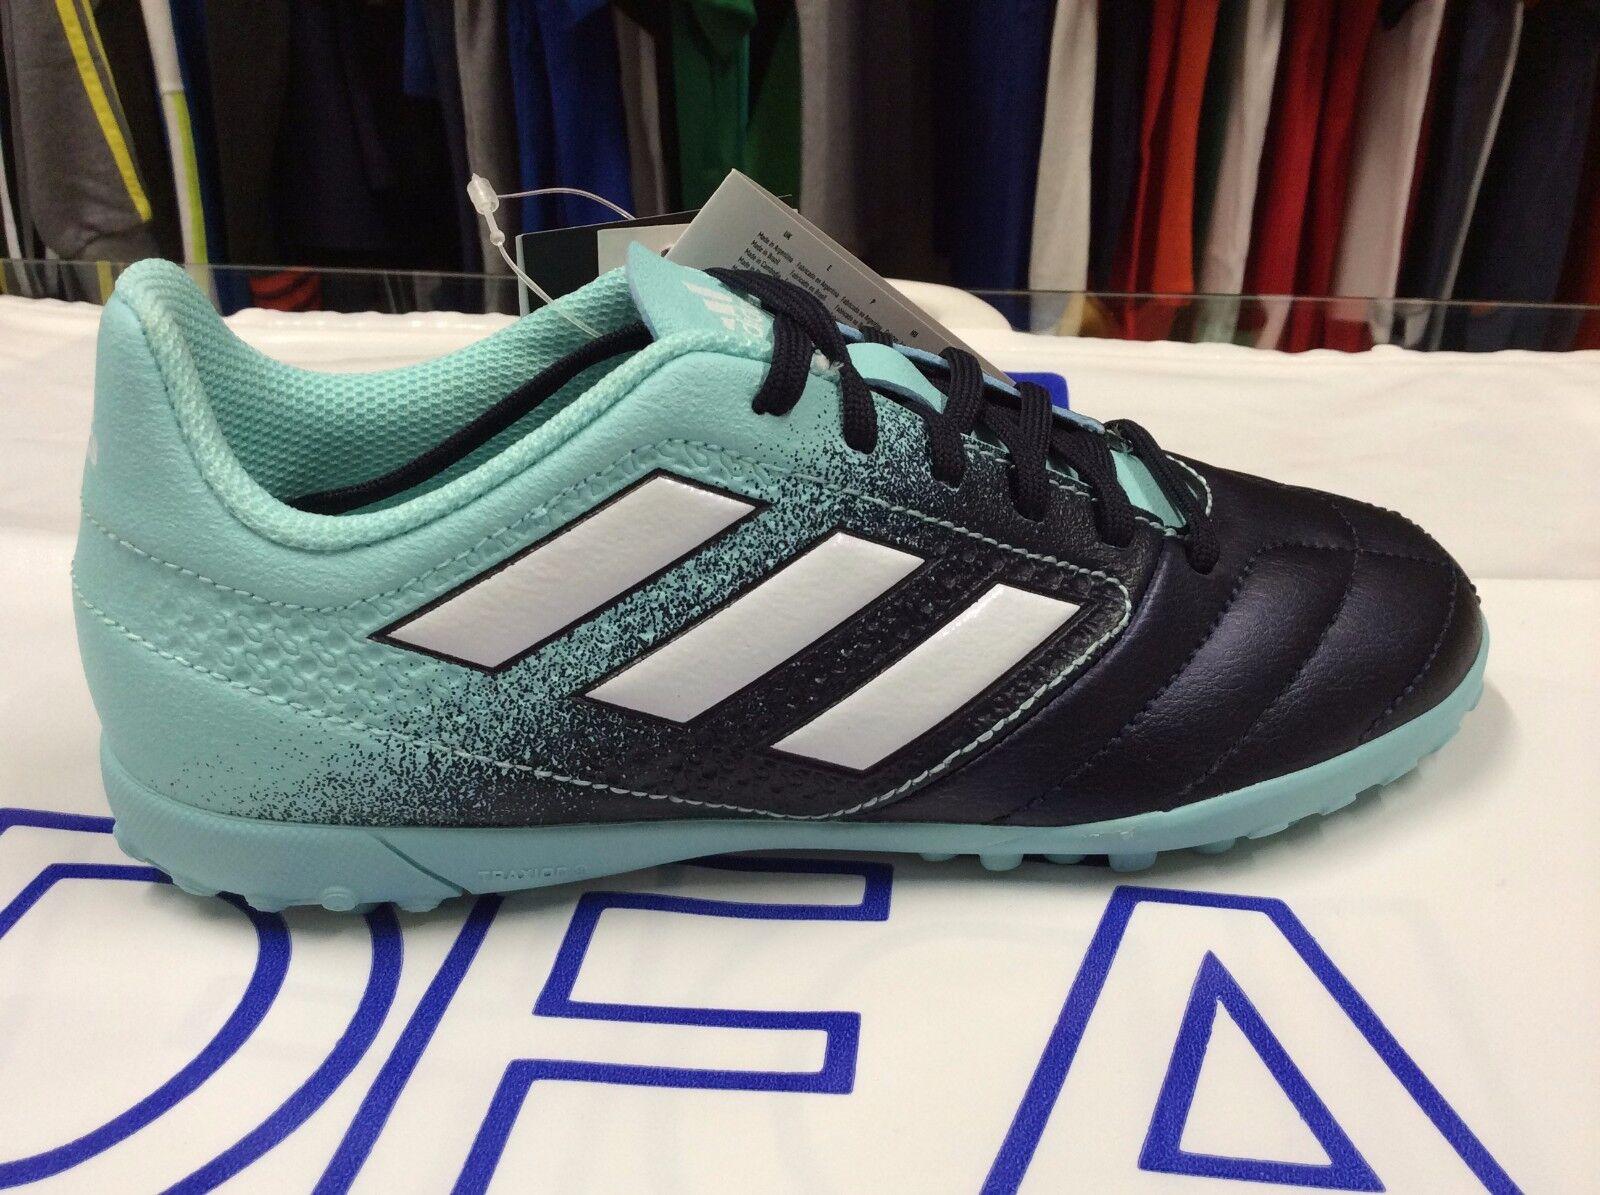 7919cdf05499 adidas Kids Shoes Futsal Outdoor Ace 17.4 TF Boys Football BOOTS ...